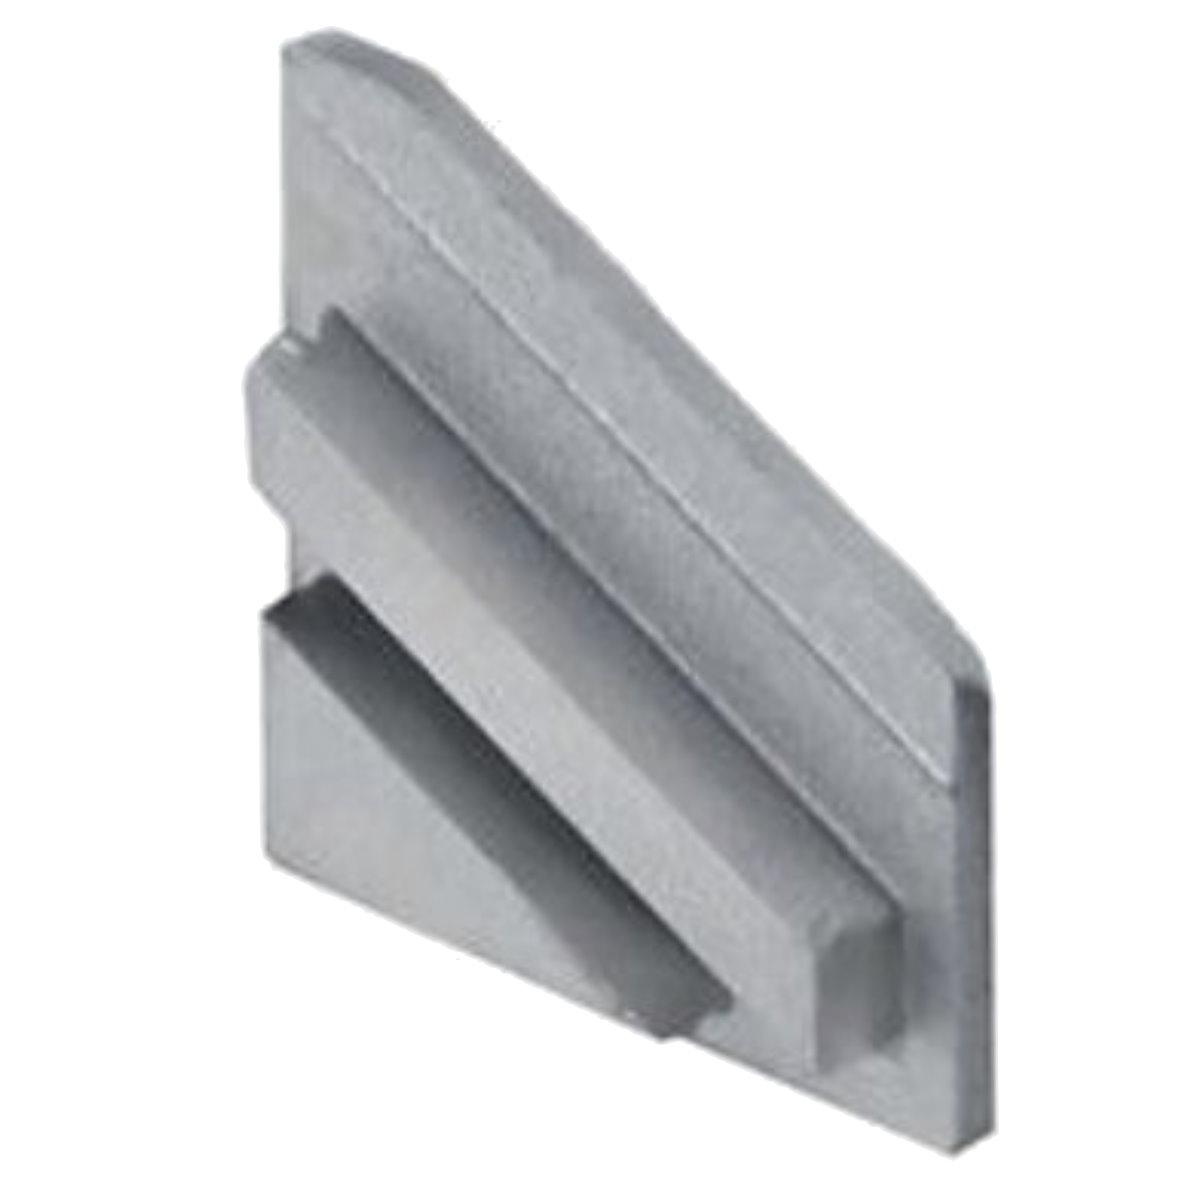 29 9 m led aluprofil alu profil schiene aluminium strip streifen lichtband ebay. Black Bedroom Furniture Sets. Home Design Ideas